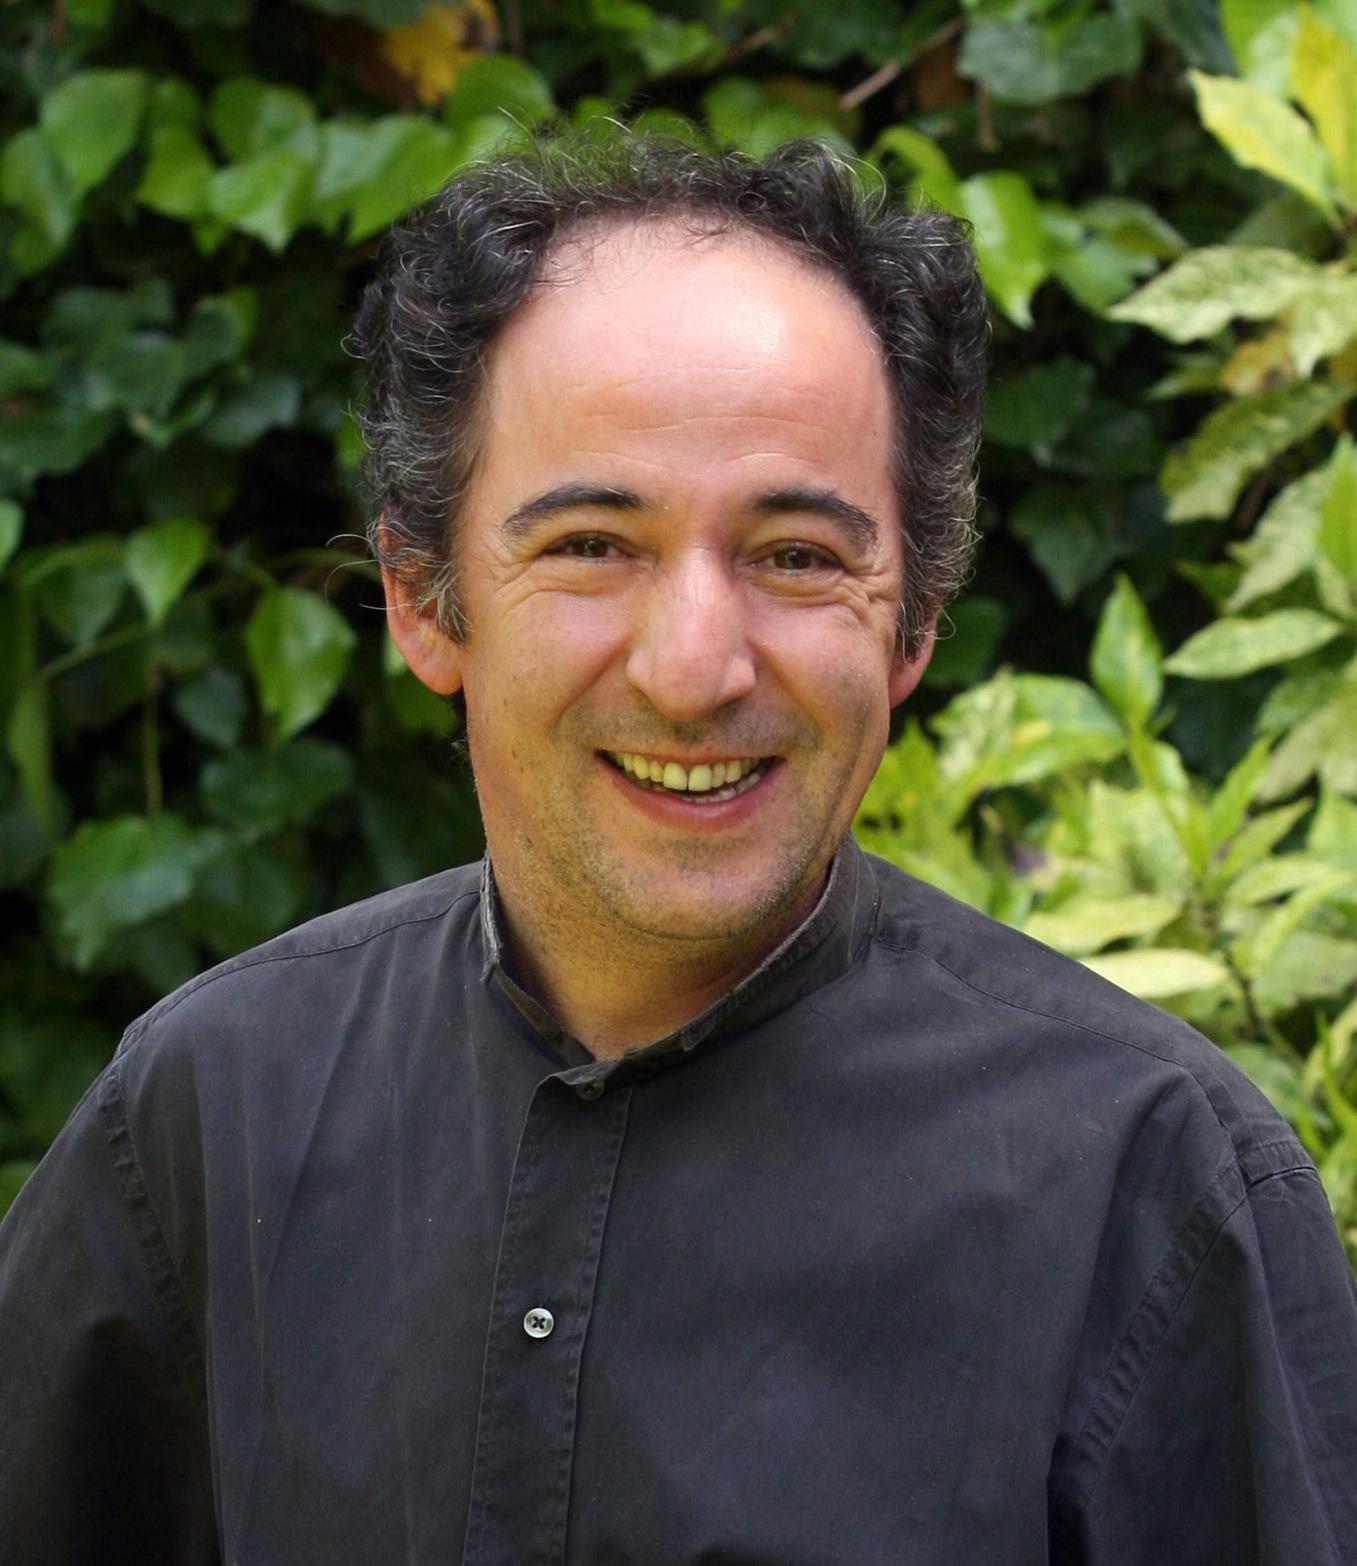 José Antonio Campoviejo